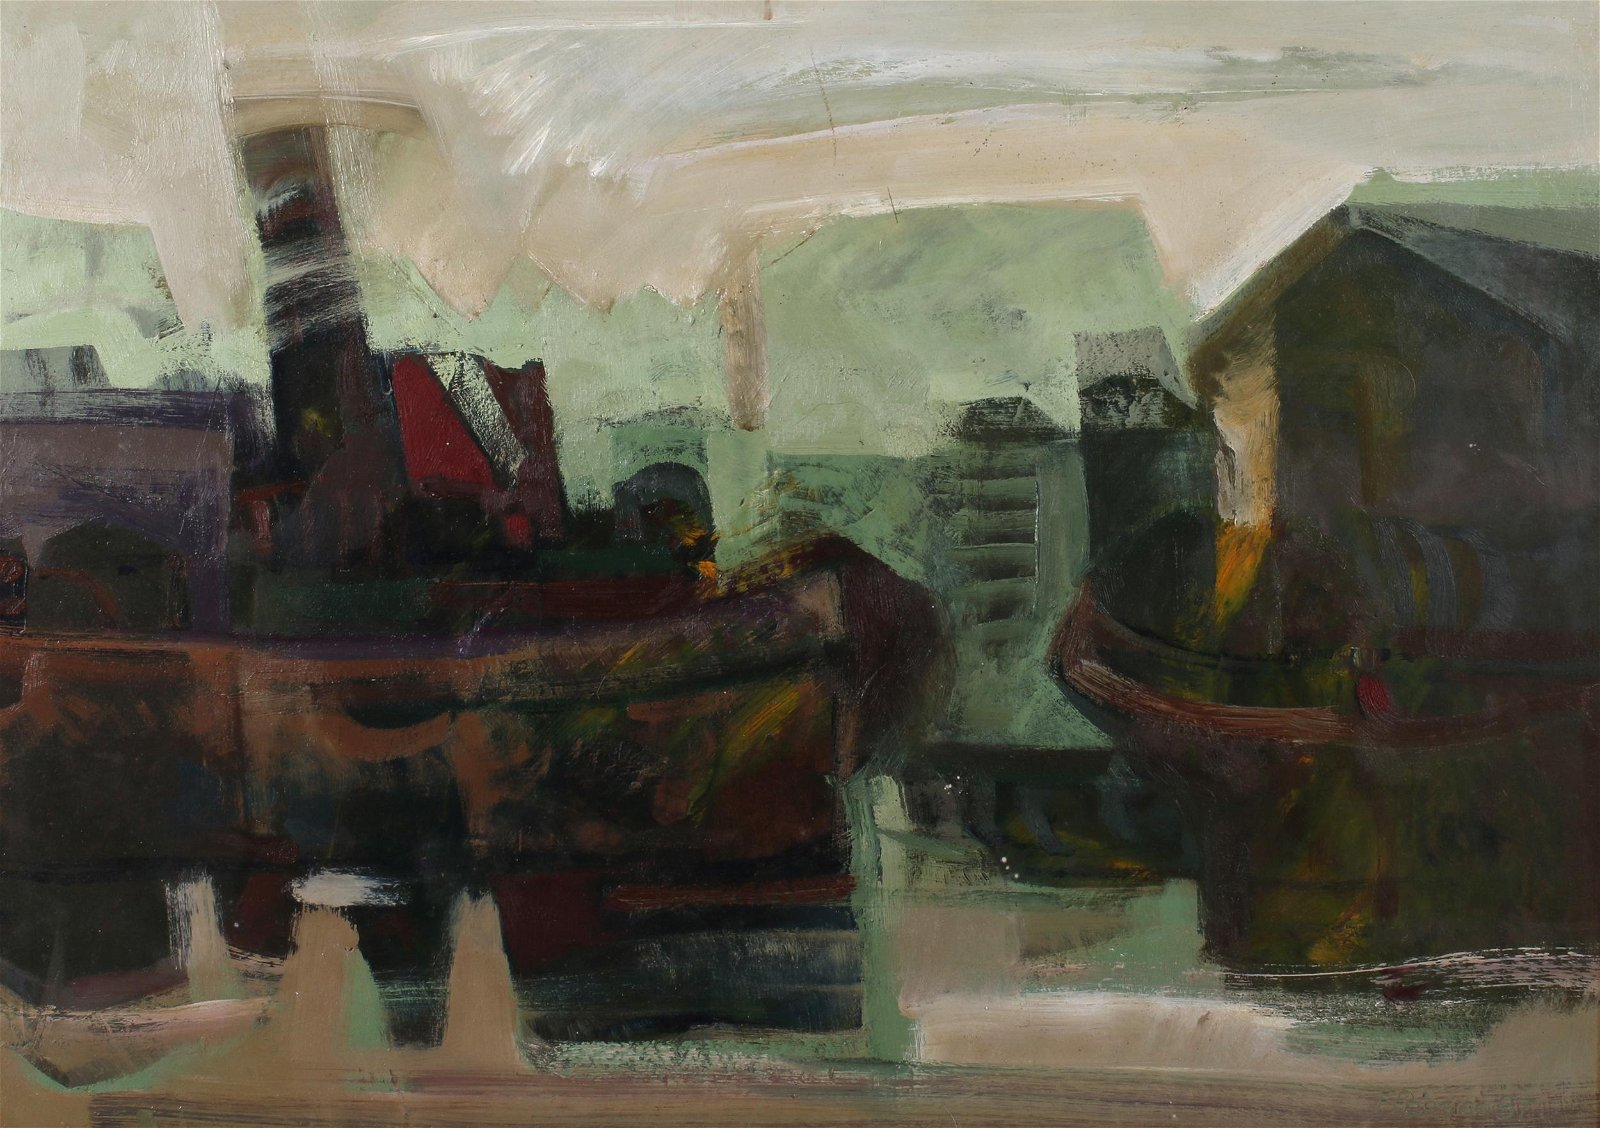 Felipe Persico (Argentinian b. 1932) Painting